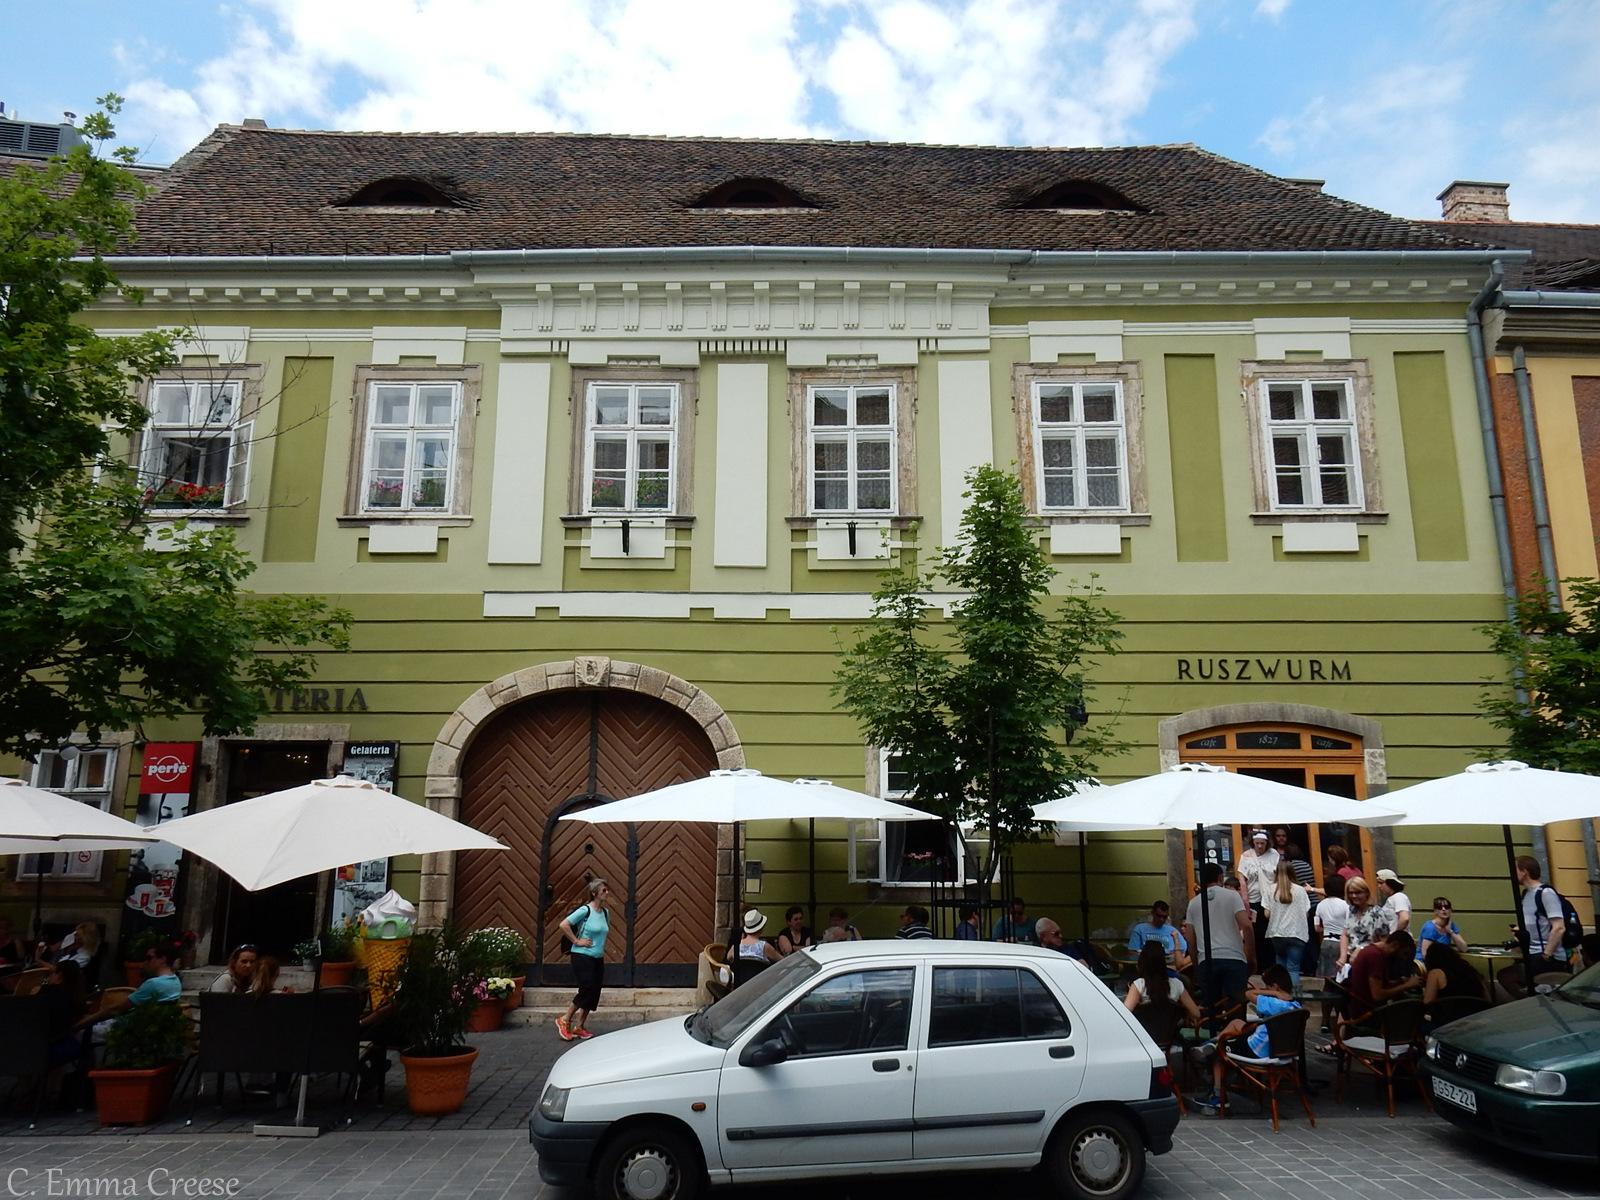 10 reasons luxury city break Ice Cream Budapest Hungary Adventures of a London Kiwi